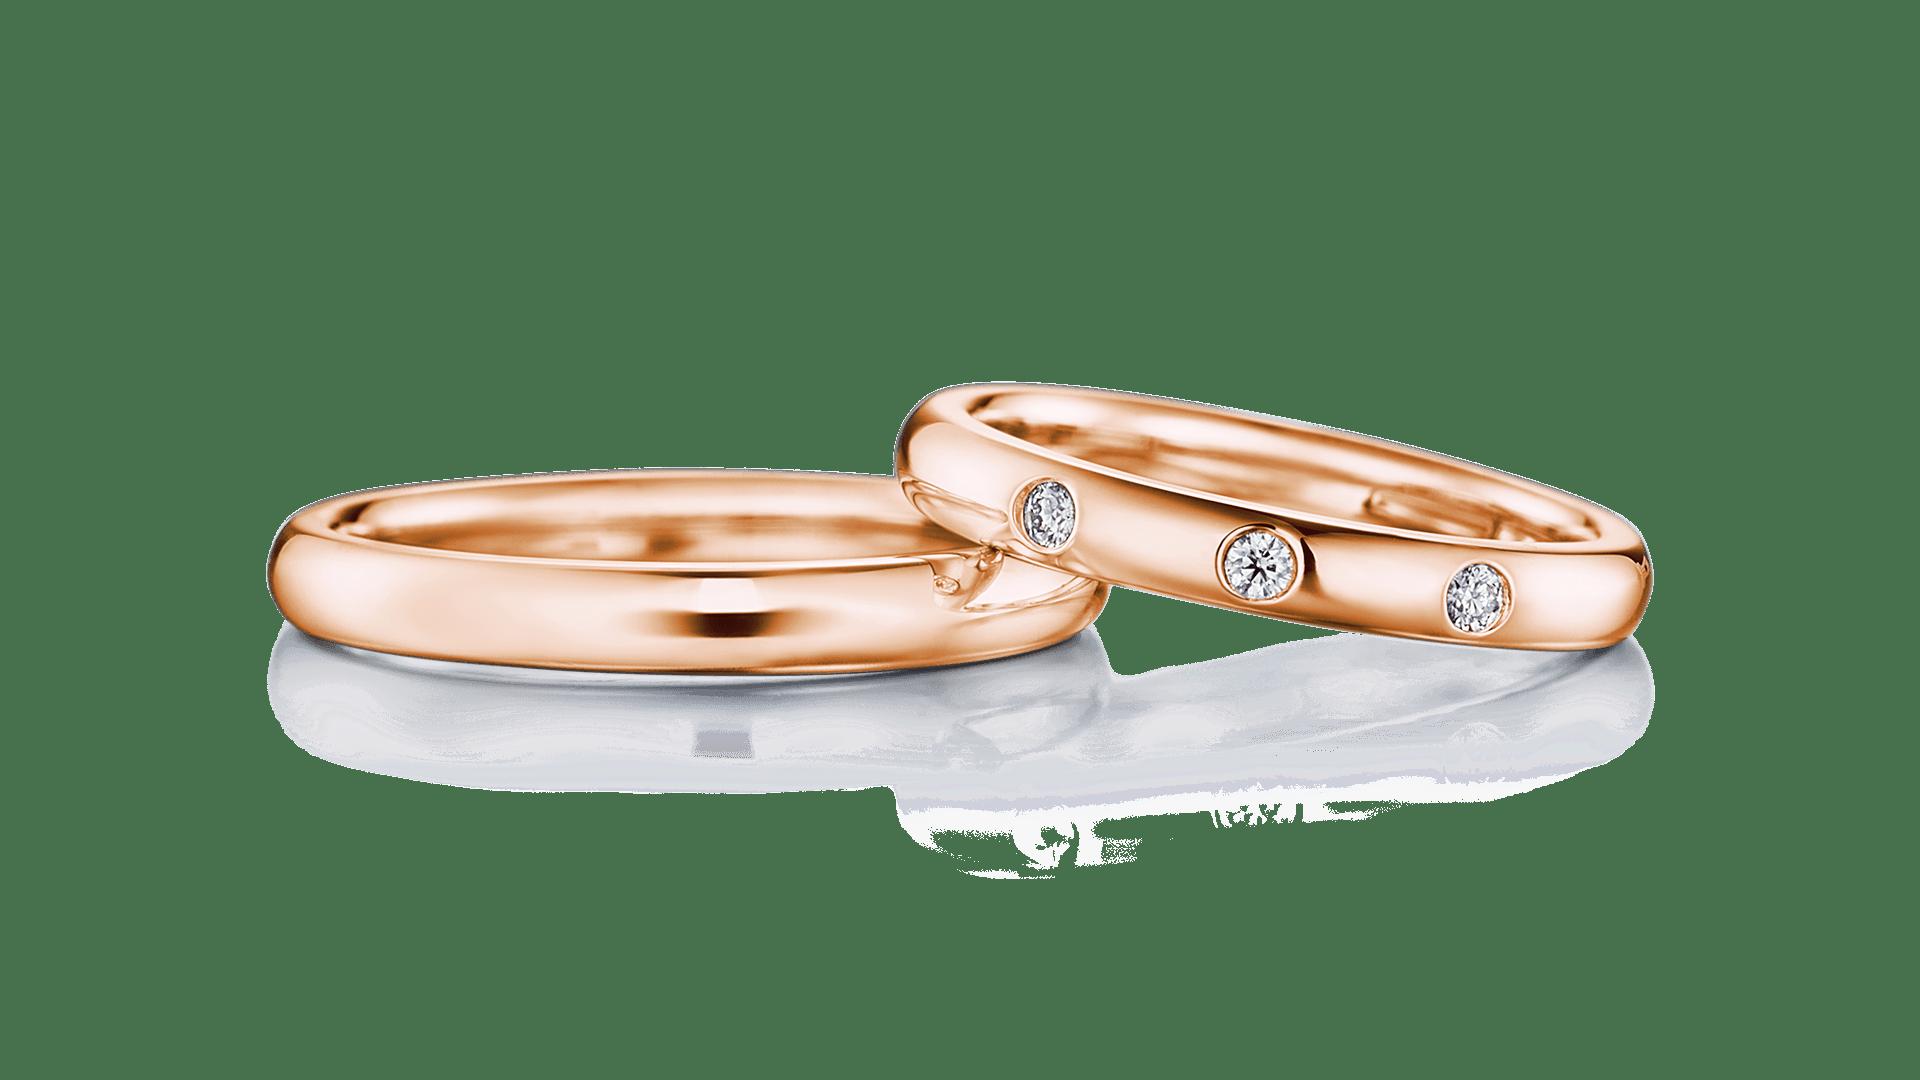 mithra ミスラ | 結婚指輪サムネイル 1